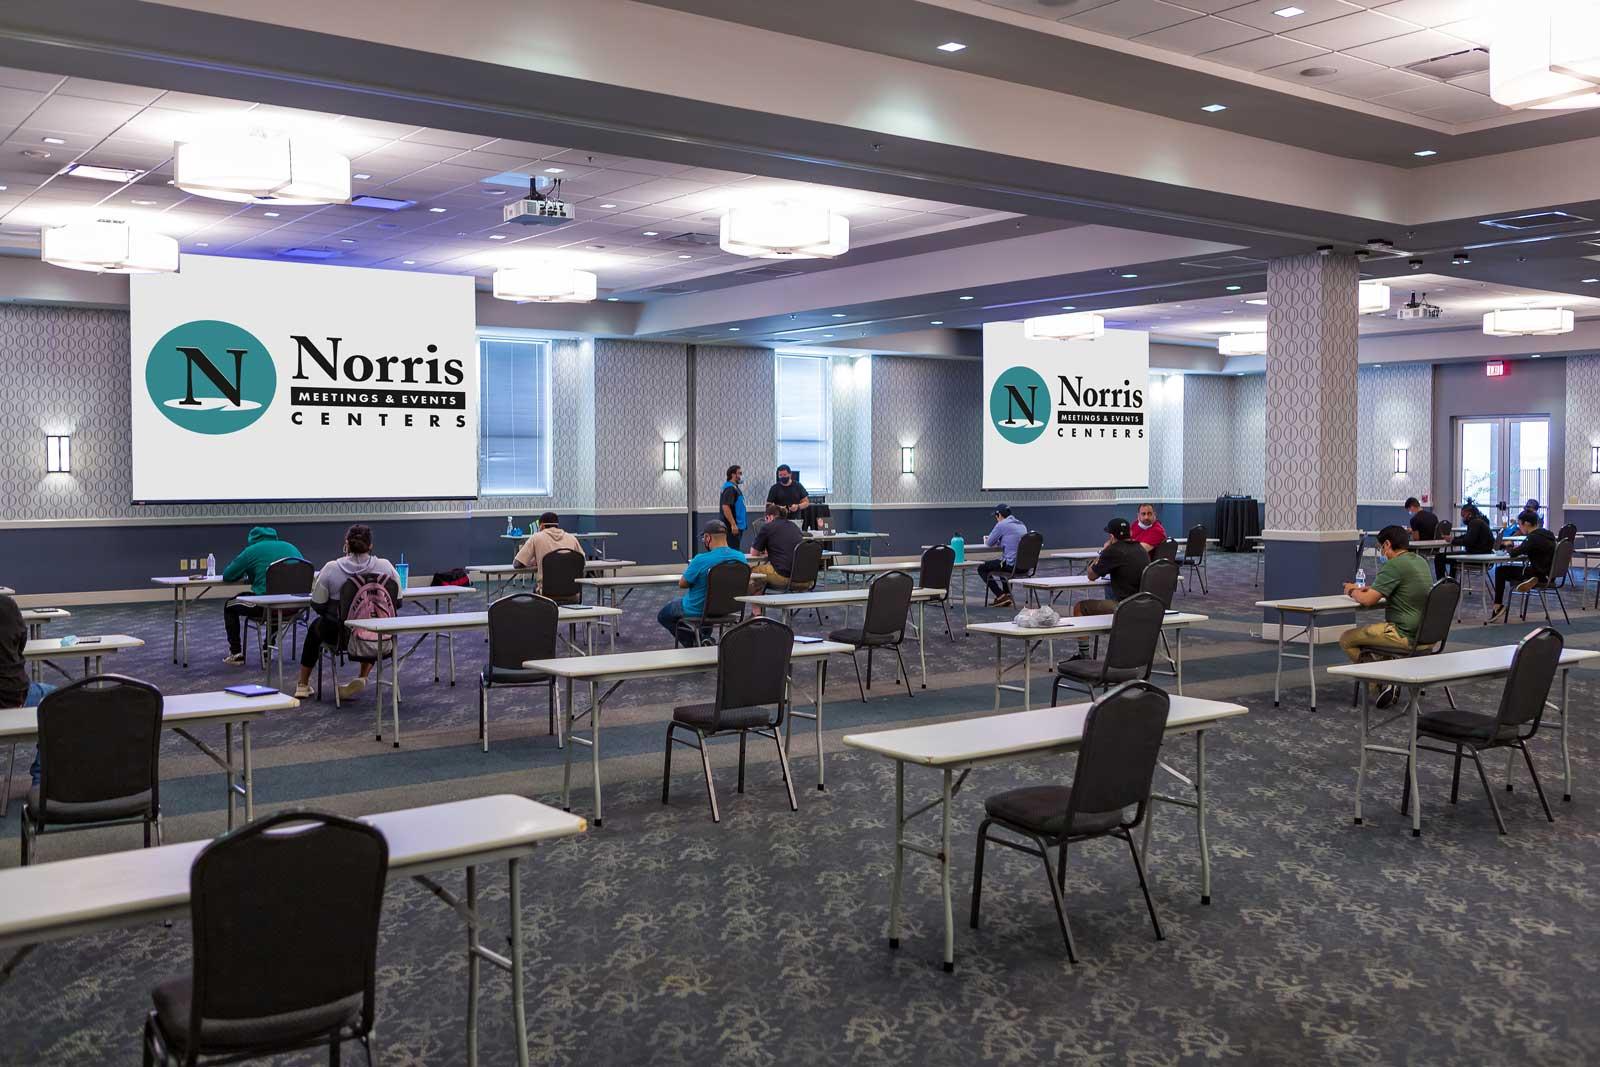 Norris Centers San Antonio, Classroom set for Social Distancing